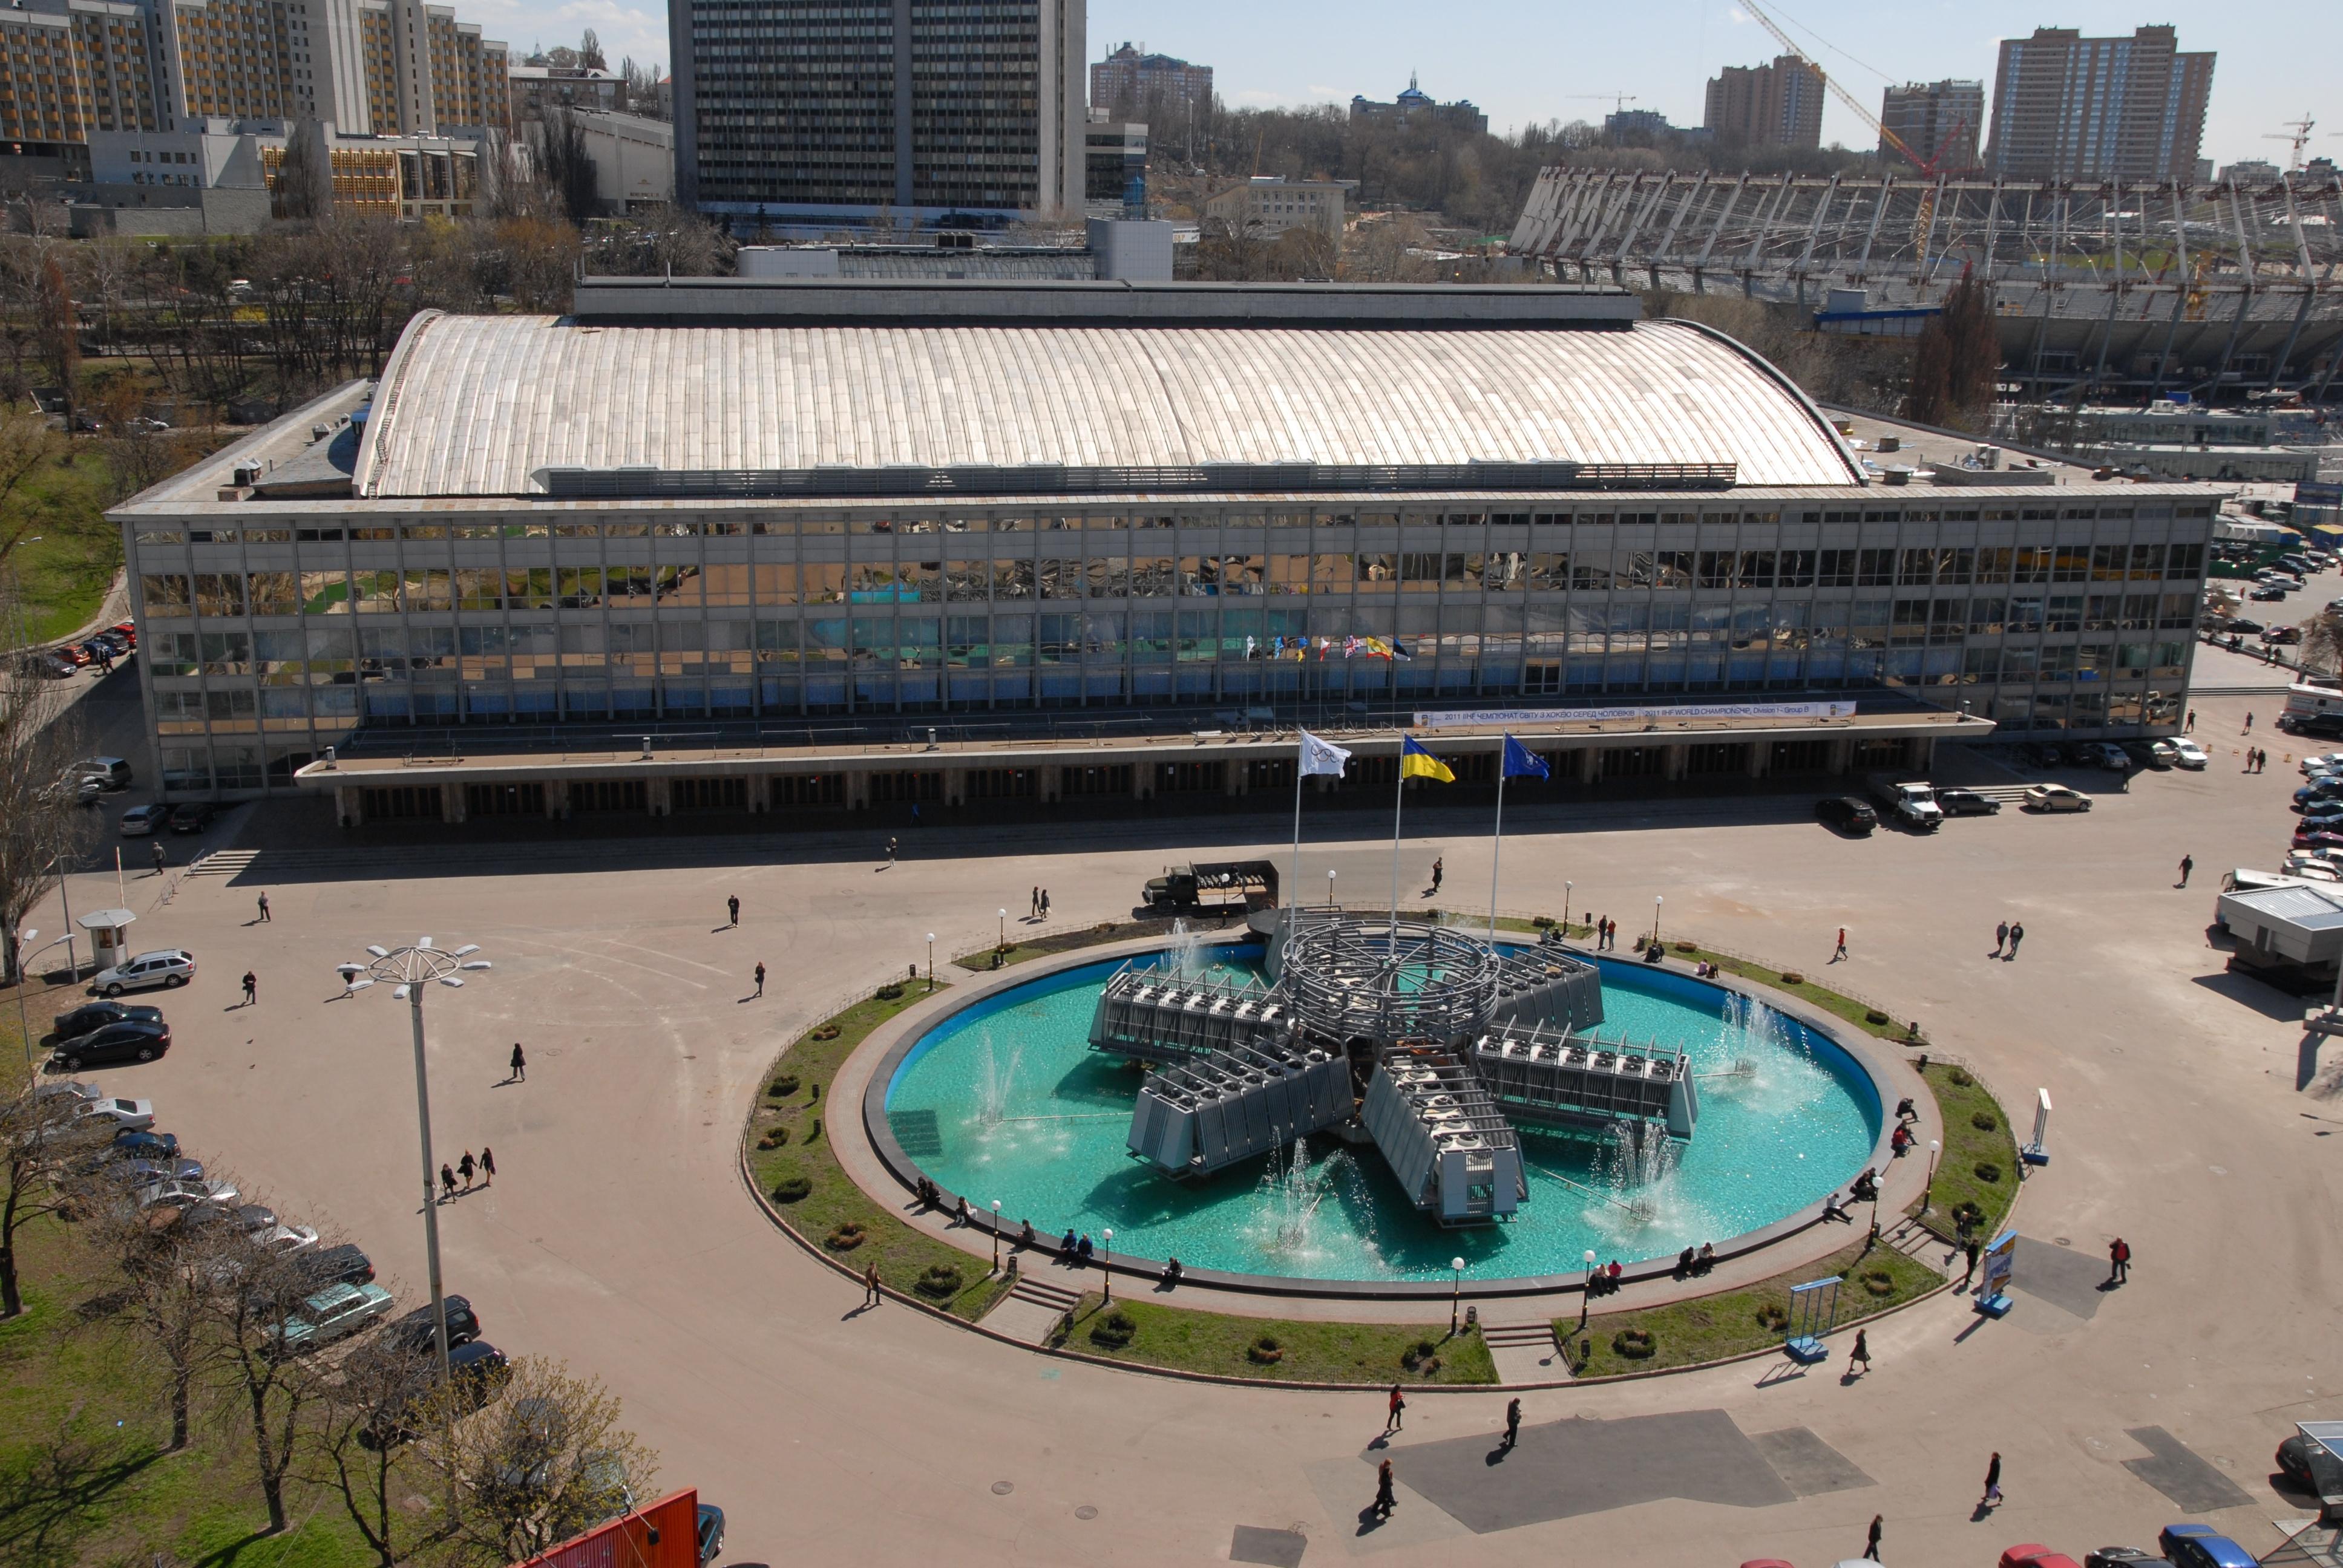 Київський палац спорту